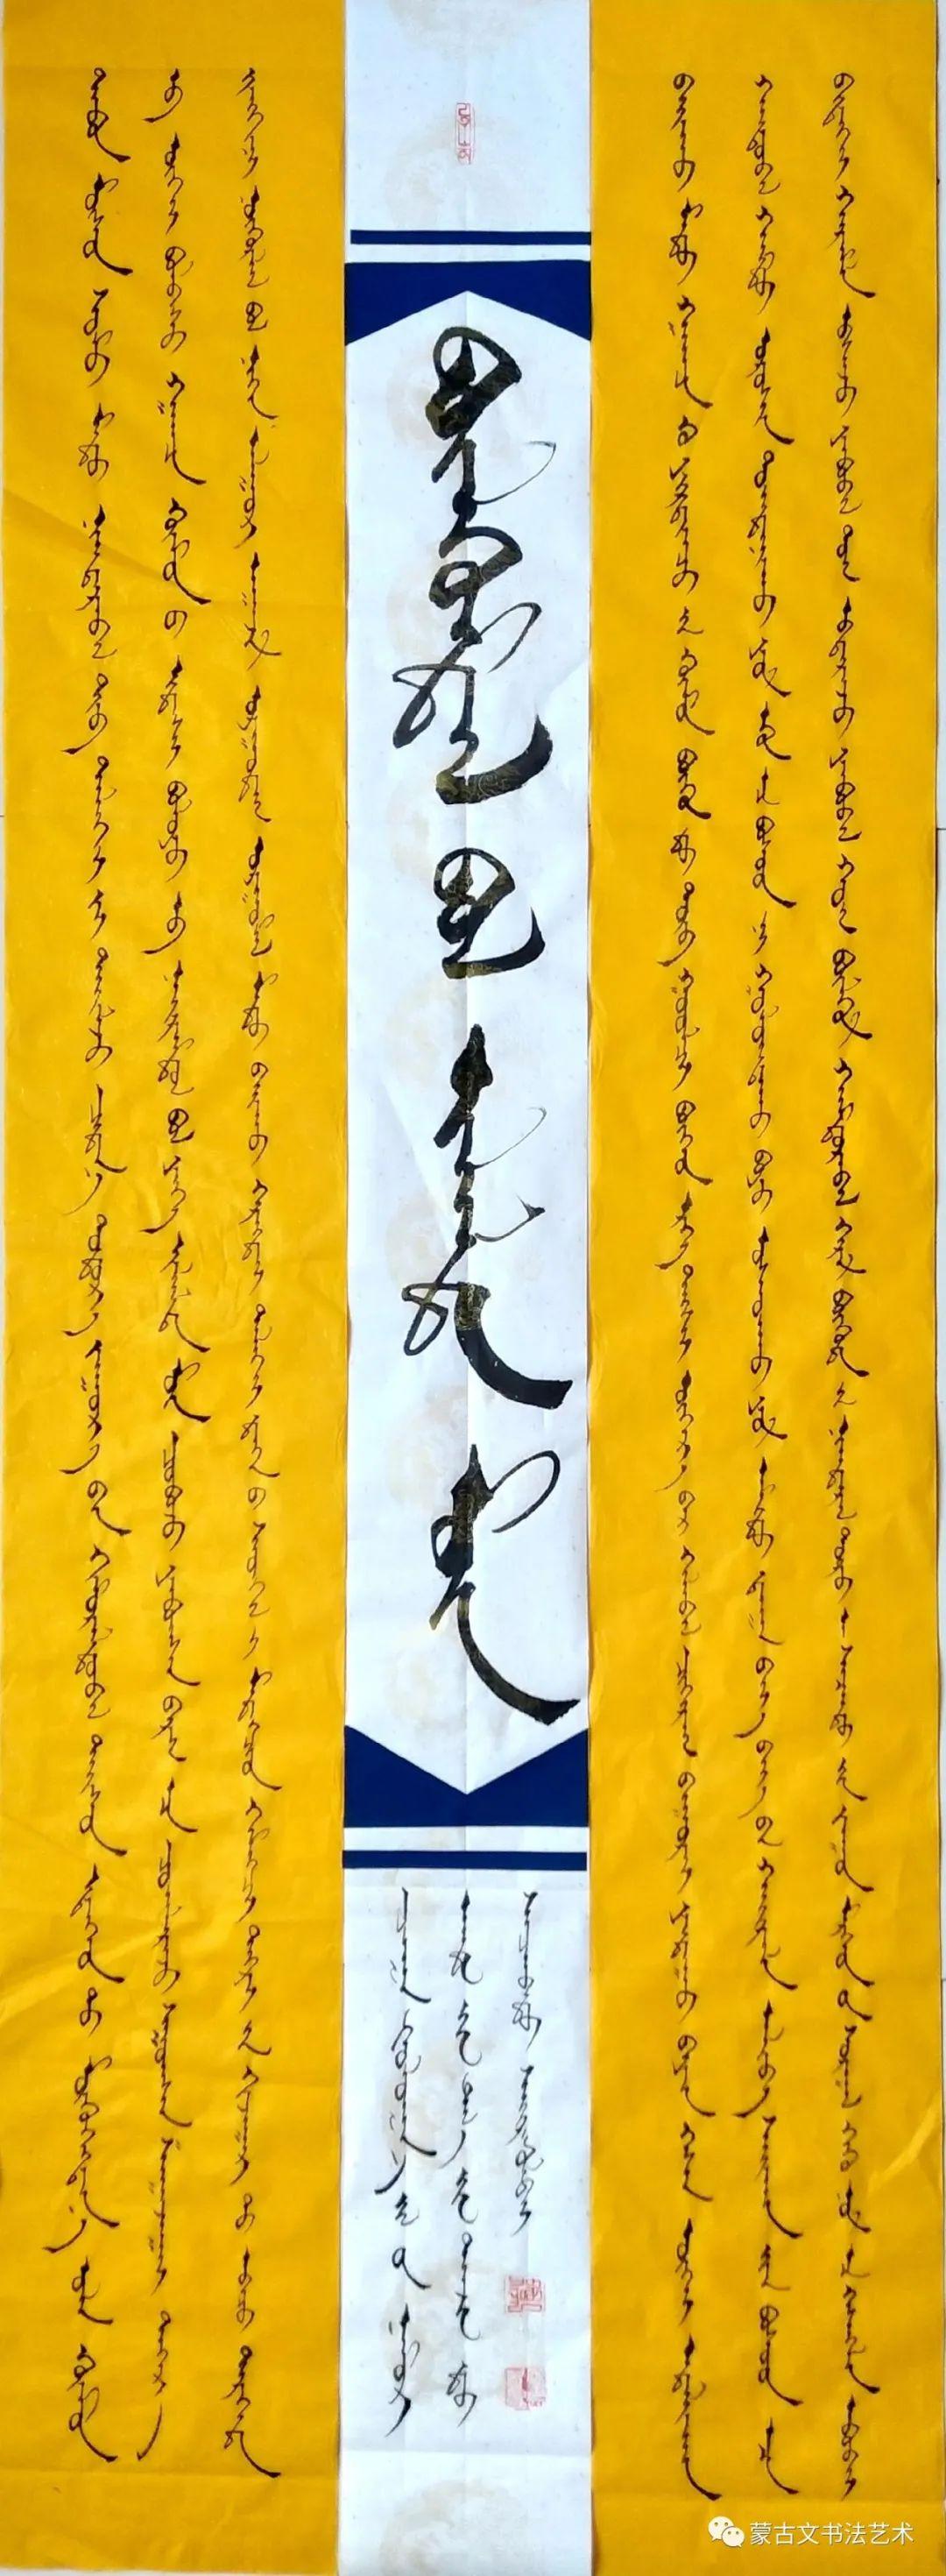 ᠪᠦᠲᠦᠭᠡᠯ  ᠰᠣᠨᠢᠷᠬᠠᠯ 第3张 ᠪᠦᠲᠦᠭᠡᠯ  ᠰᠣᠨᠢᠷᠬᠠᠯ 蒙古书法